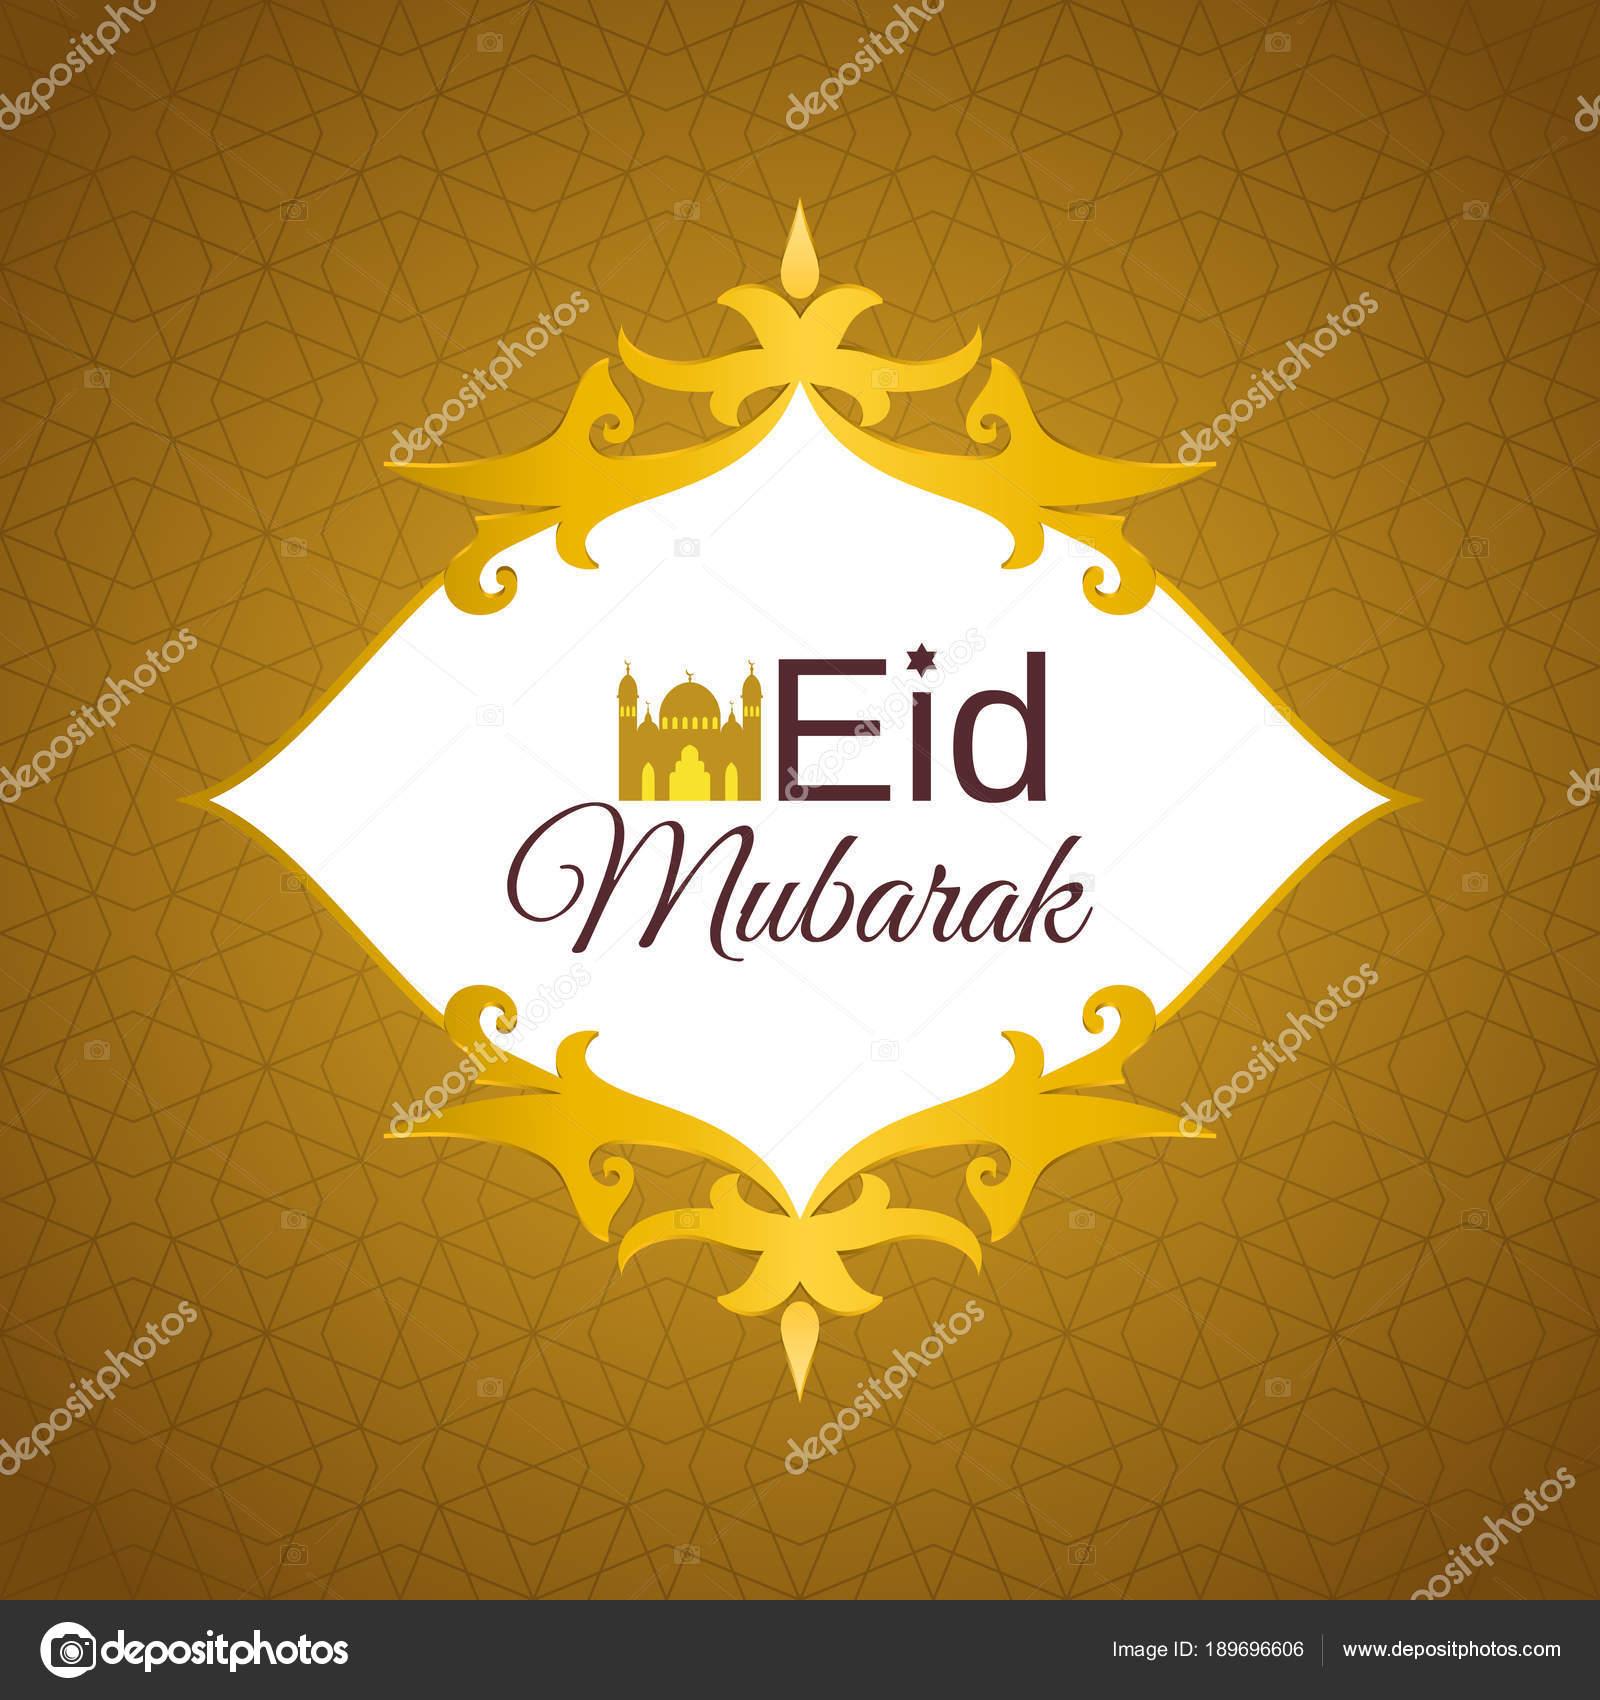 Eid mubarak greeting card with islamic geometric patterns stock eid mubarak greeting card with islamic geometric patterns stock vector m4hsunfo